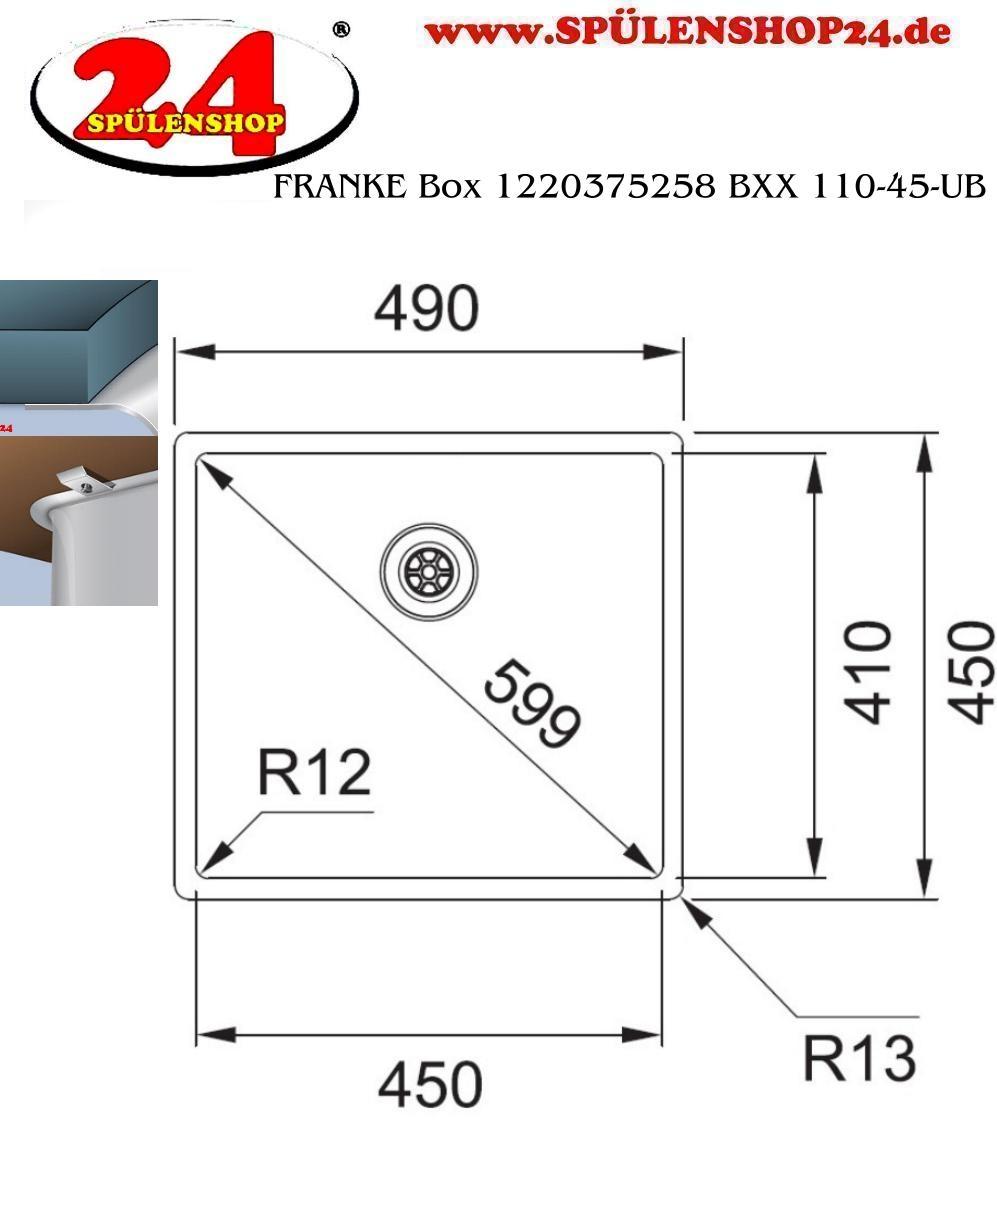 FRANKE BOX BXX 110-45 Spüle Edelstahl 122.0375.258 11012